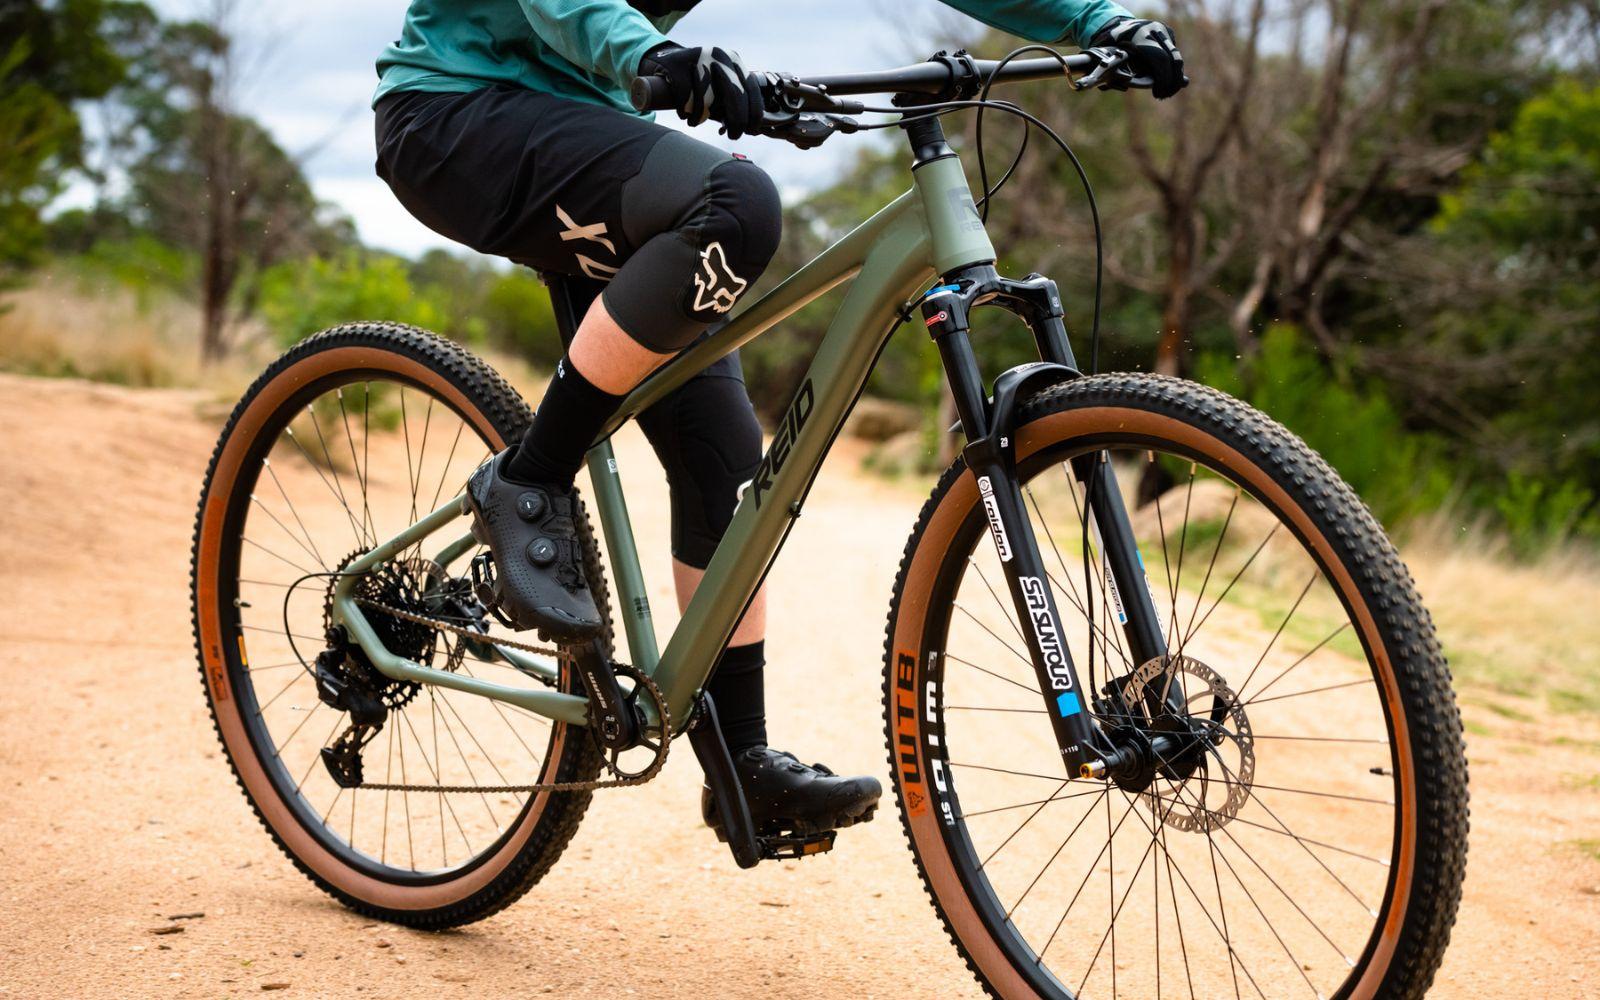 Vice 3.0 2 - Reid ® - Neon Bike